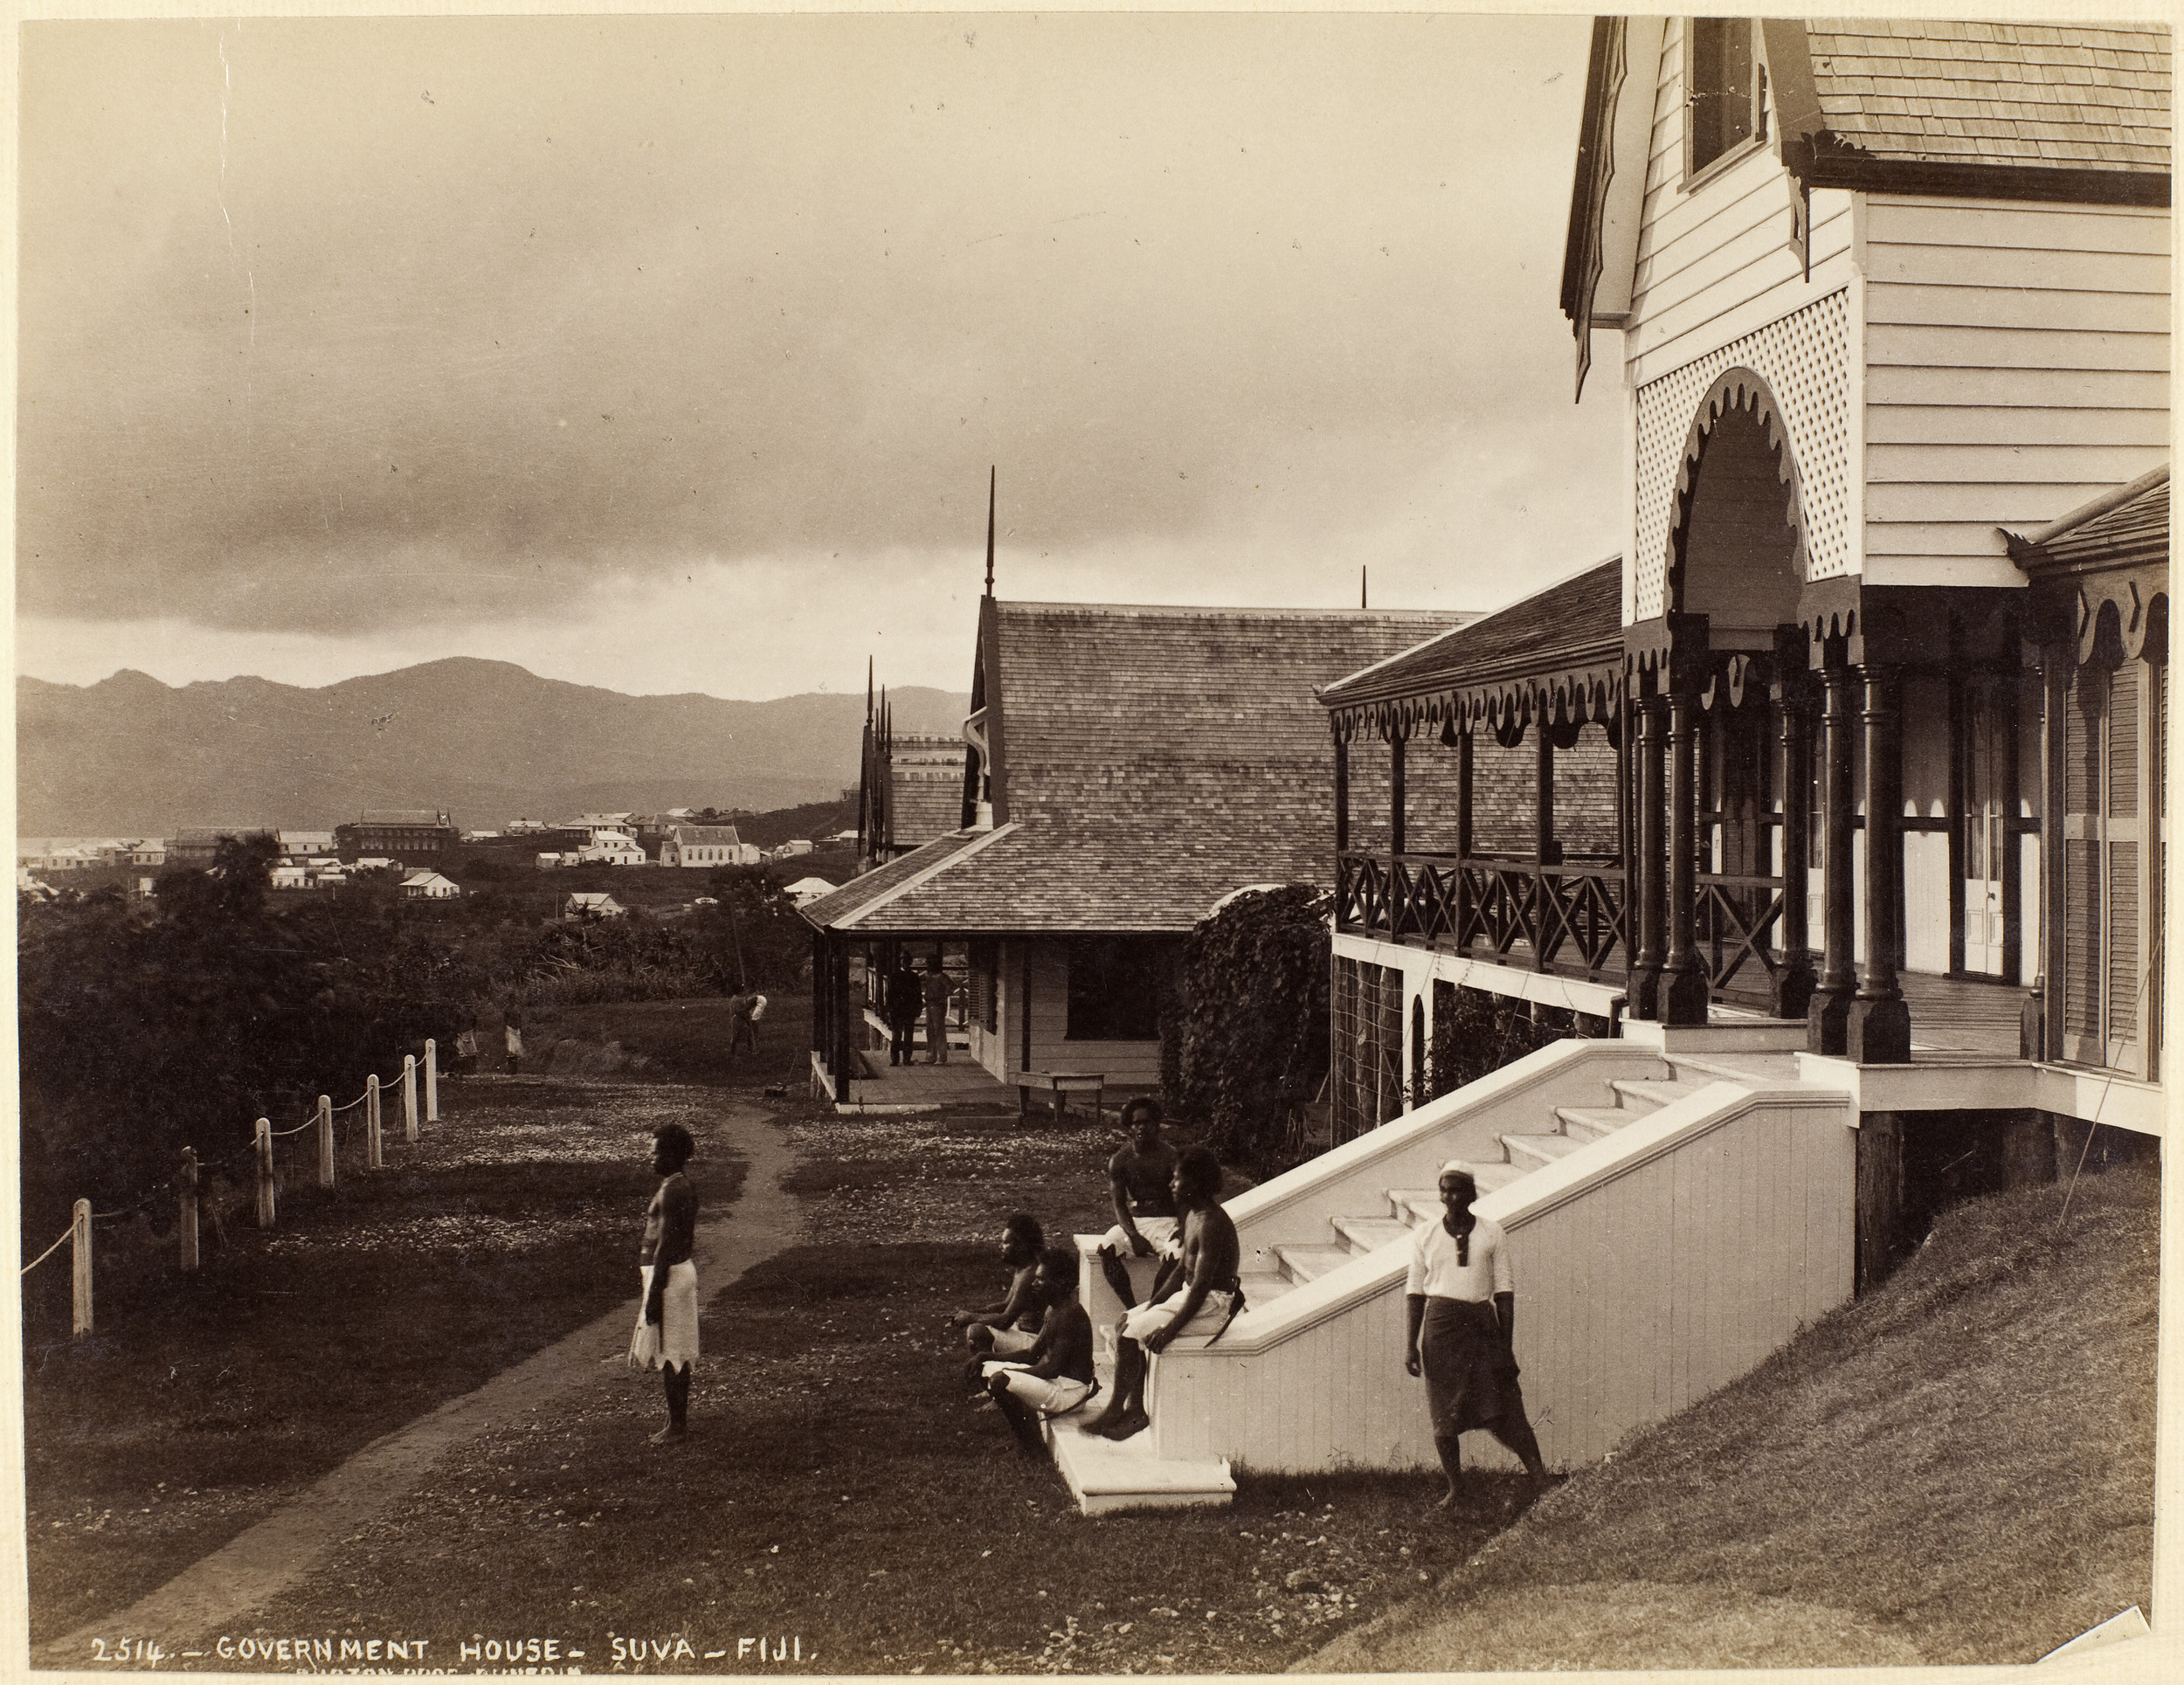 Museum of New Zealand: Gouvernment House- Suva- Fiji, Burton Brothers Studio, 1884